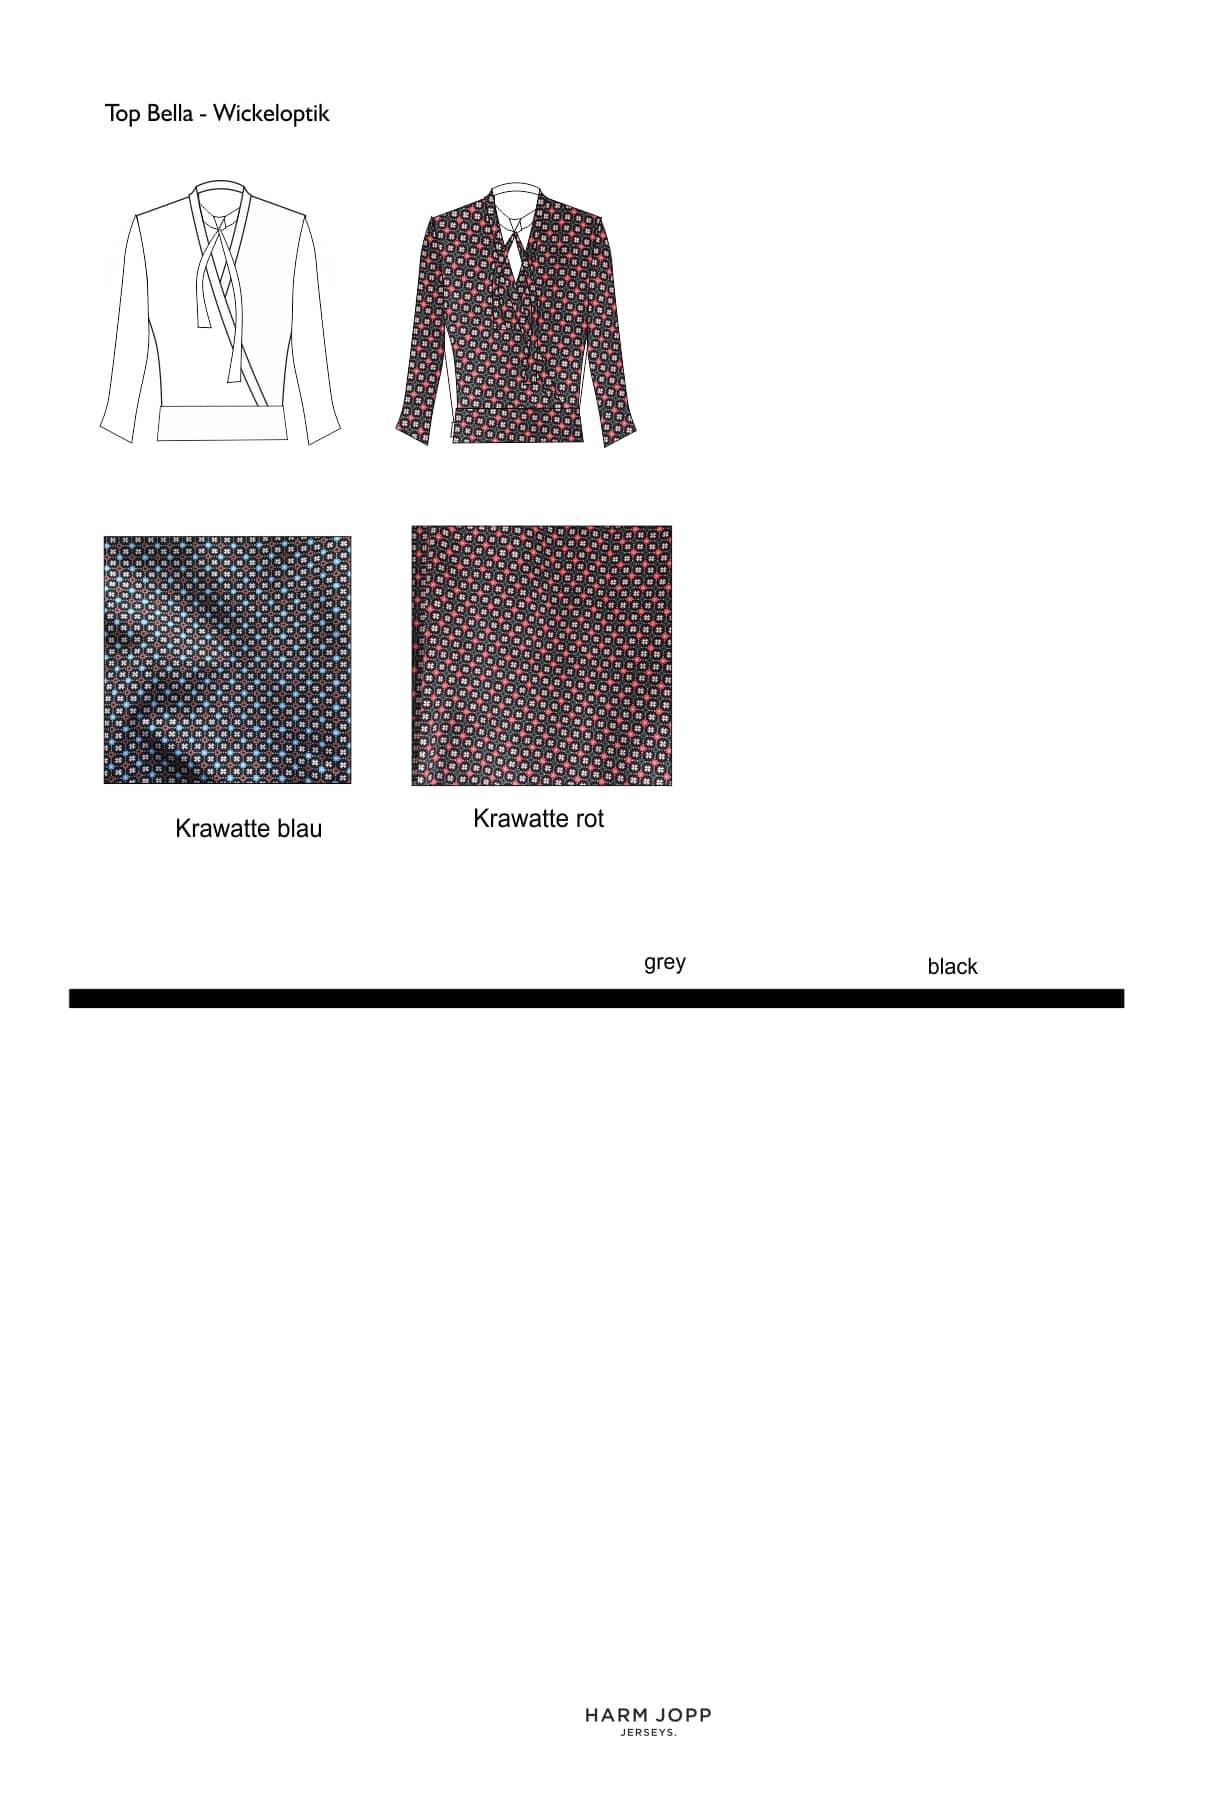 zeichung top bella uni online shop 1